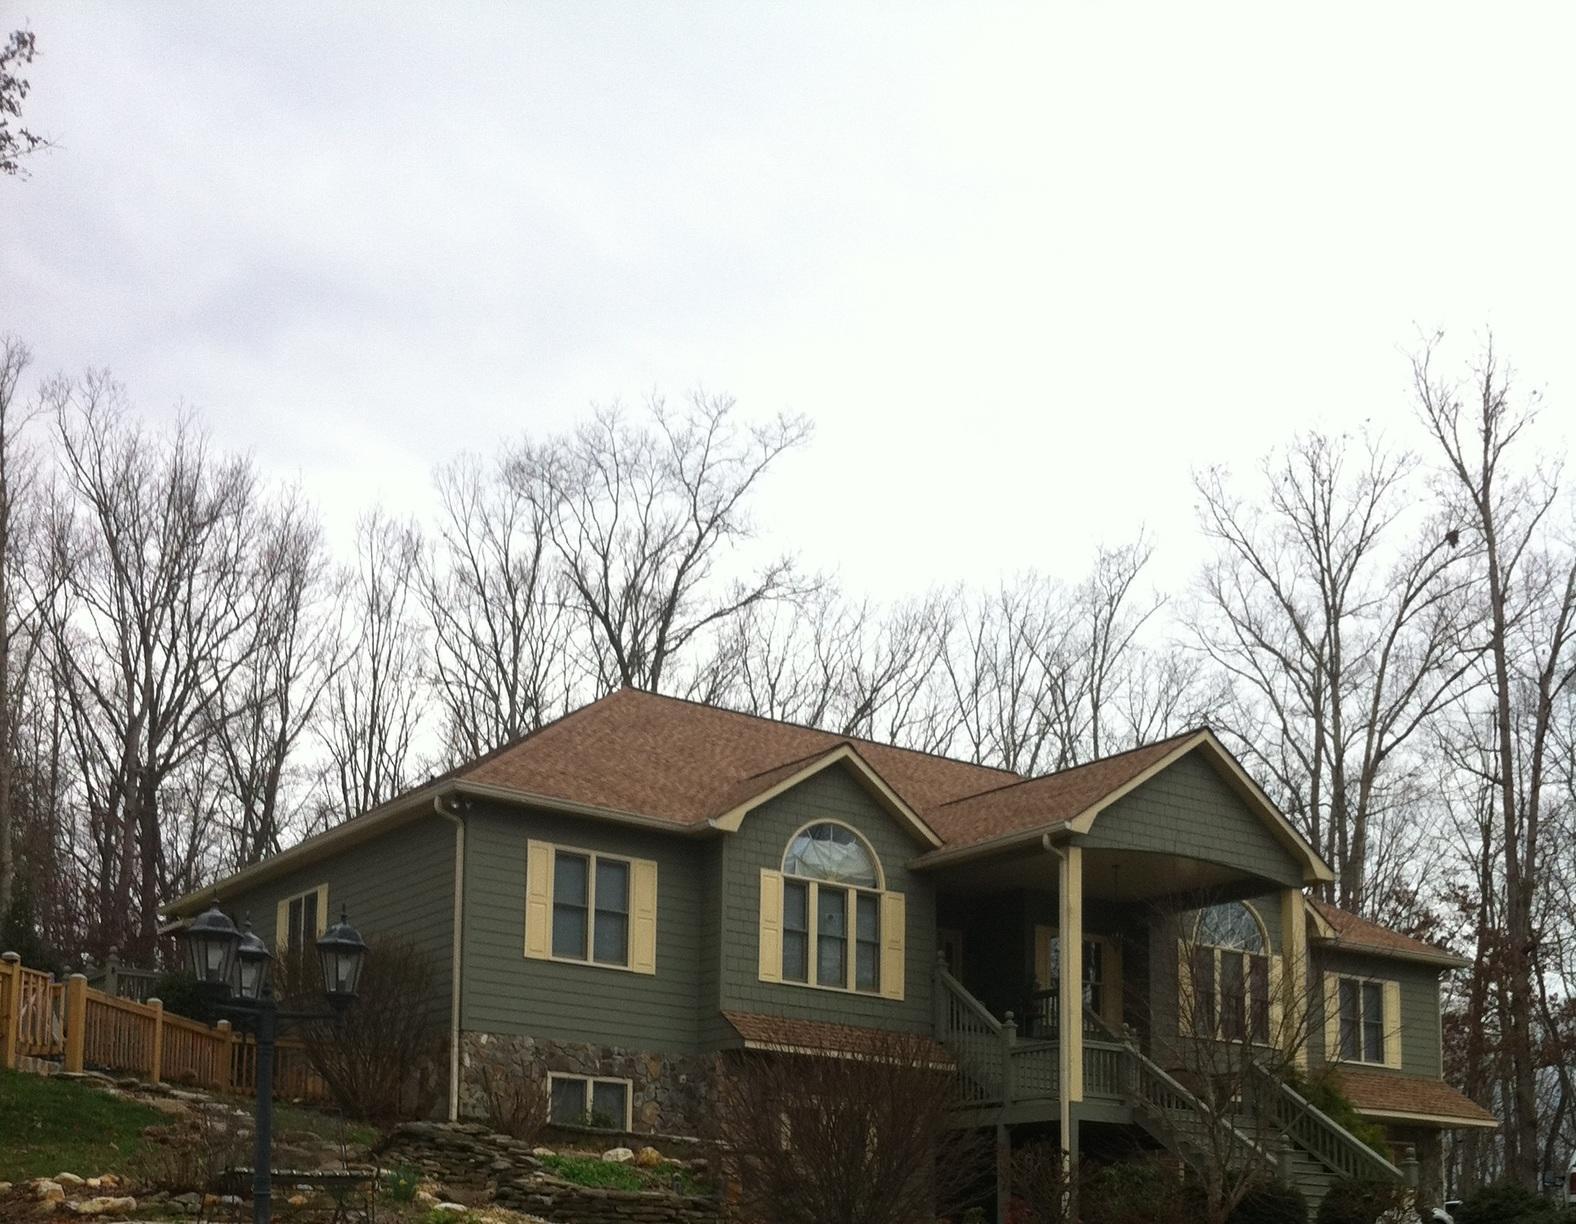 Hail Damage Roof Repair in Blue Ridge, GA - After Photo